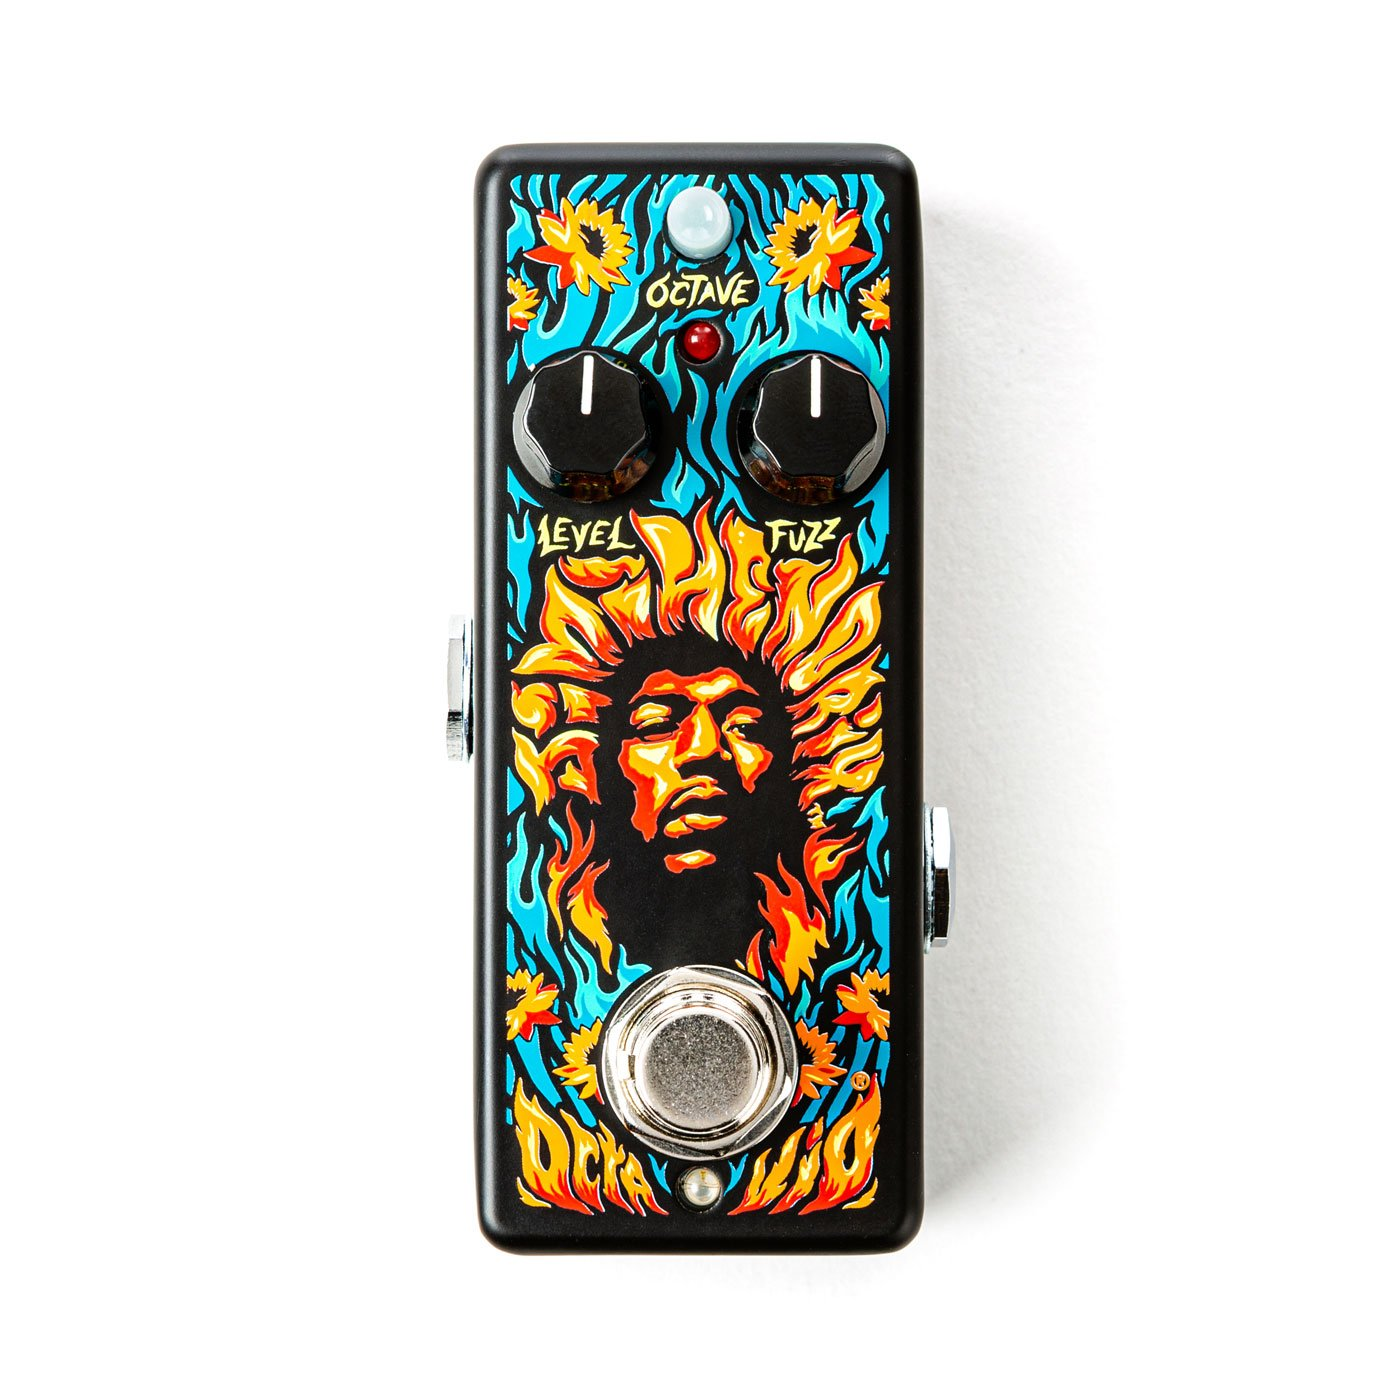 MXR Authentic Hendrix '69 Psych Series Octavio Fuzz